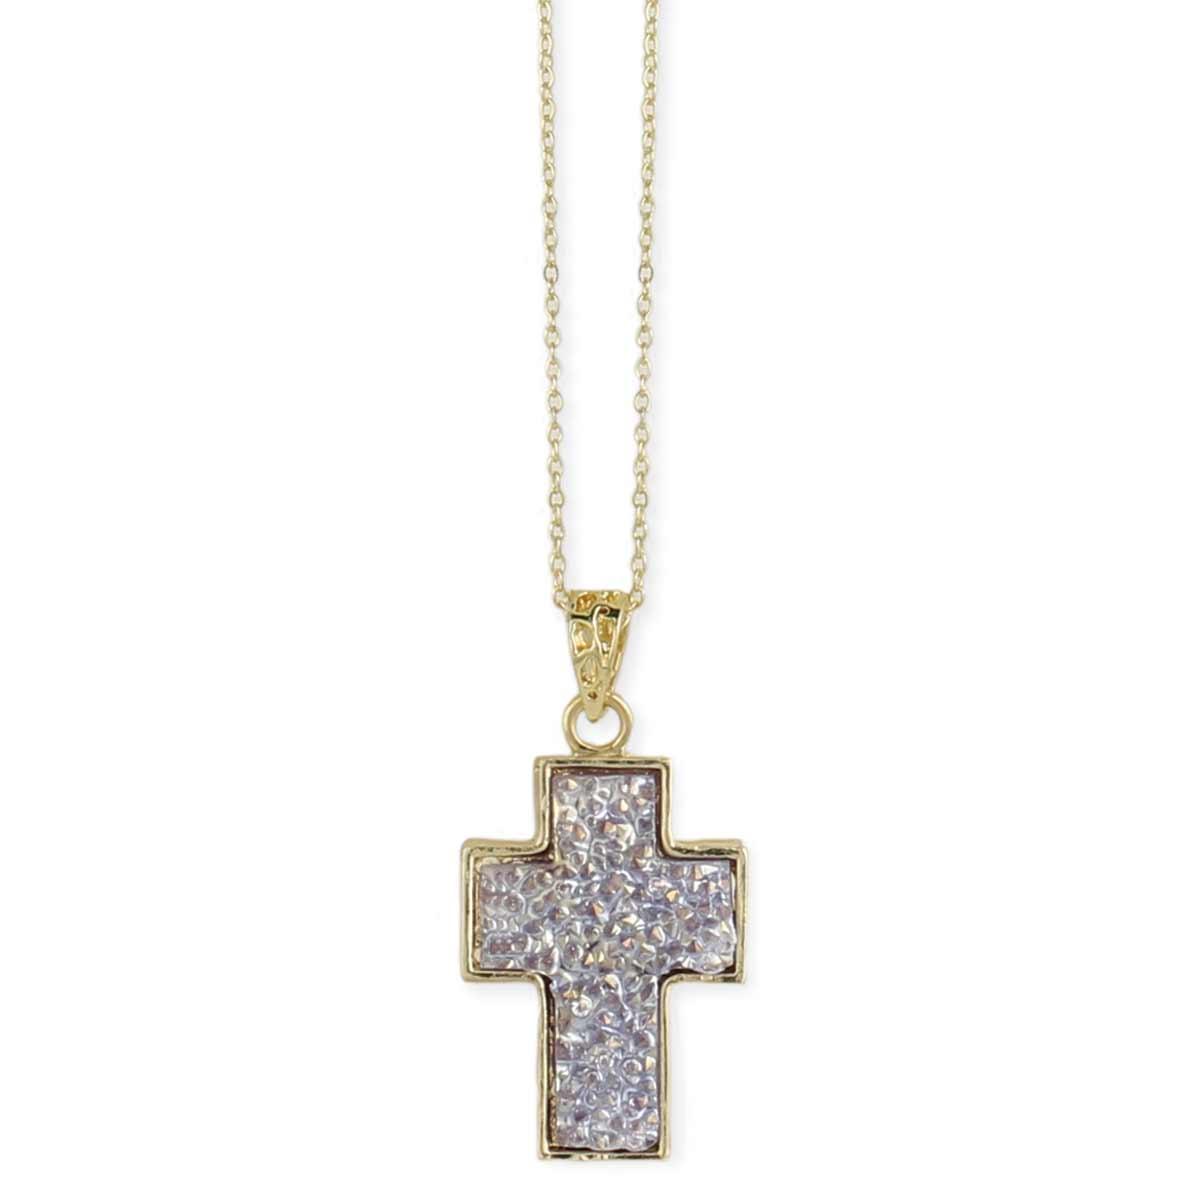 Faux Druzy Cross Pendant